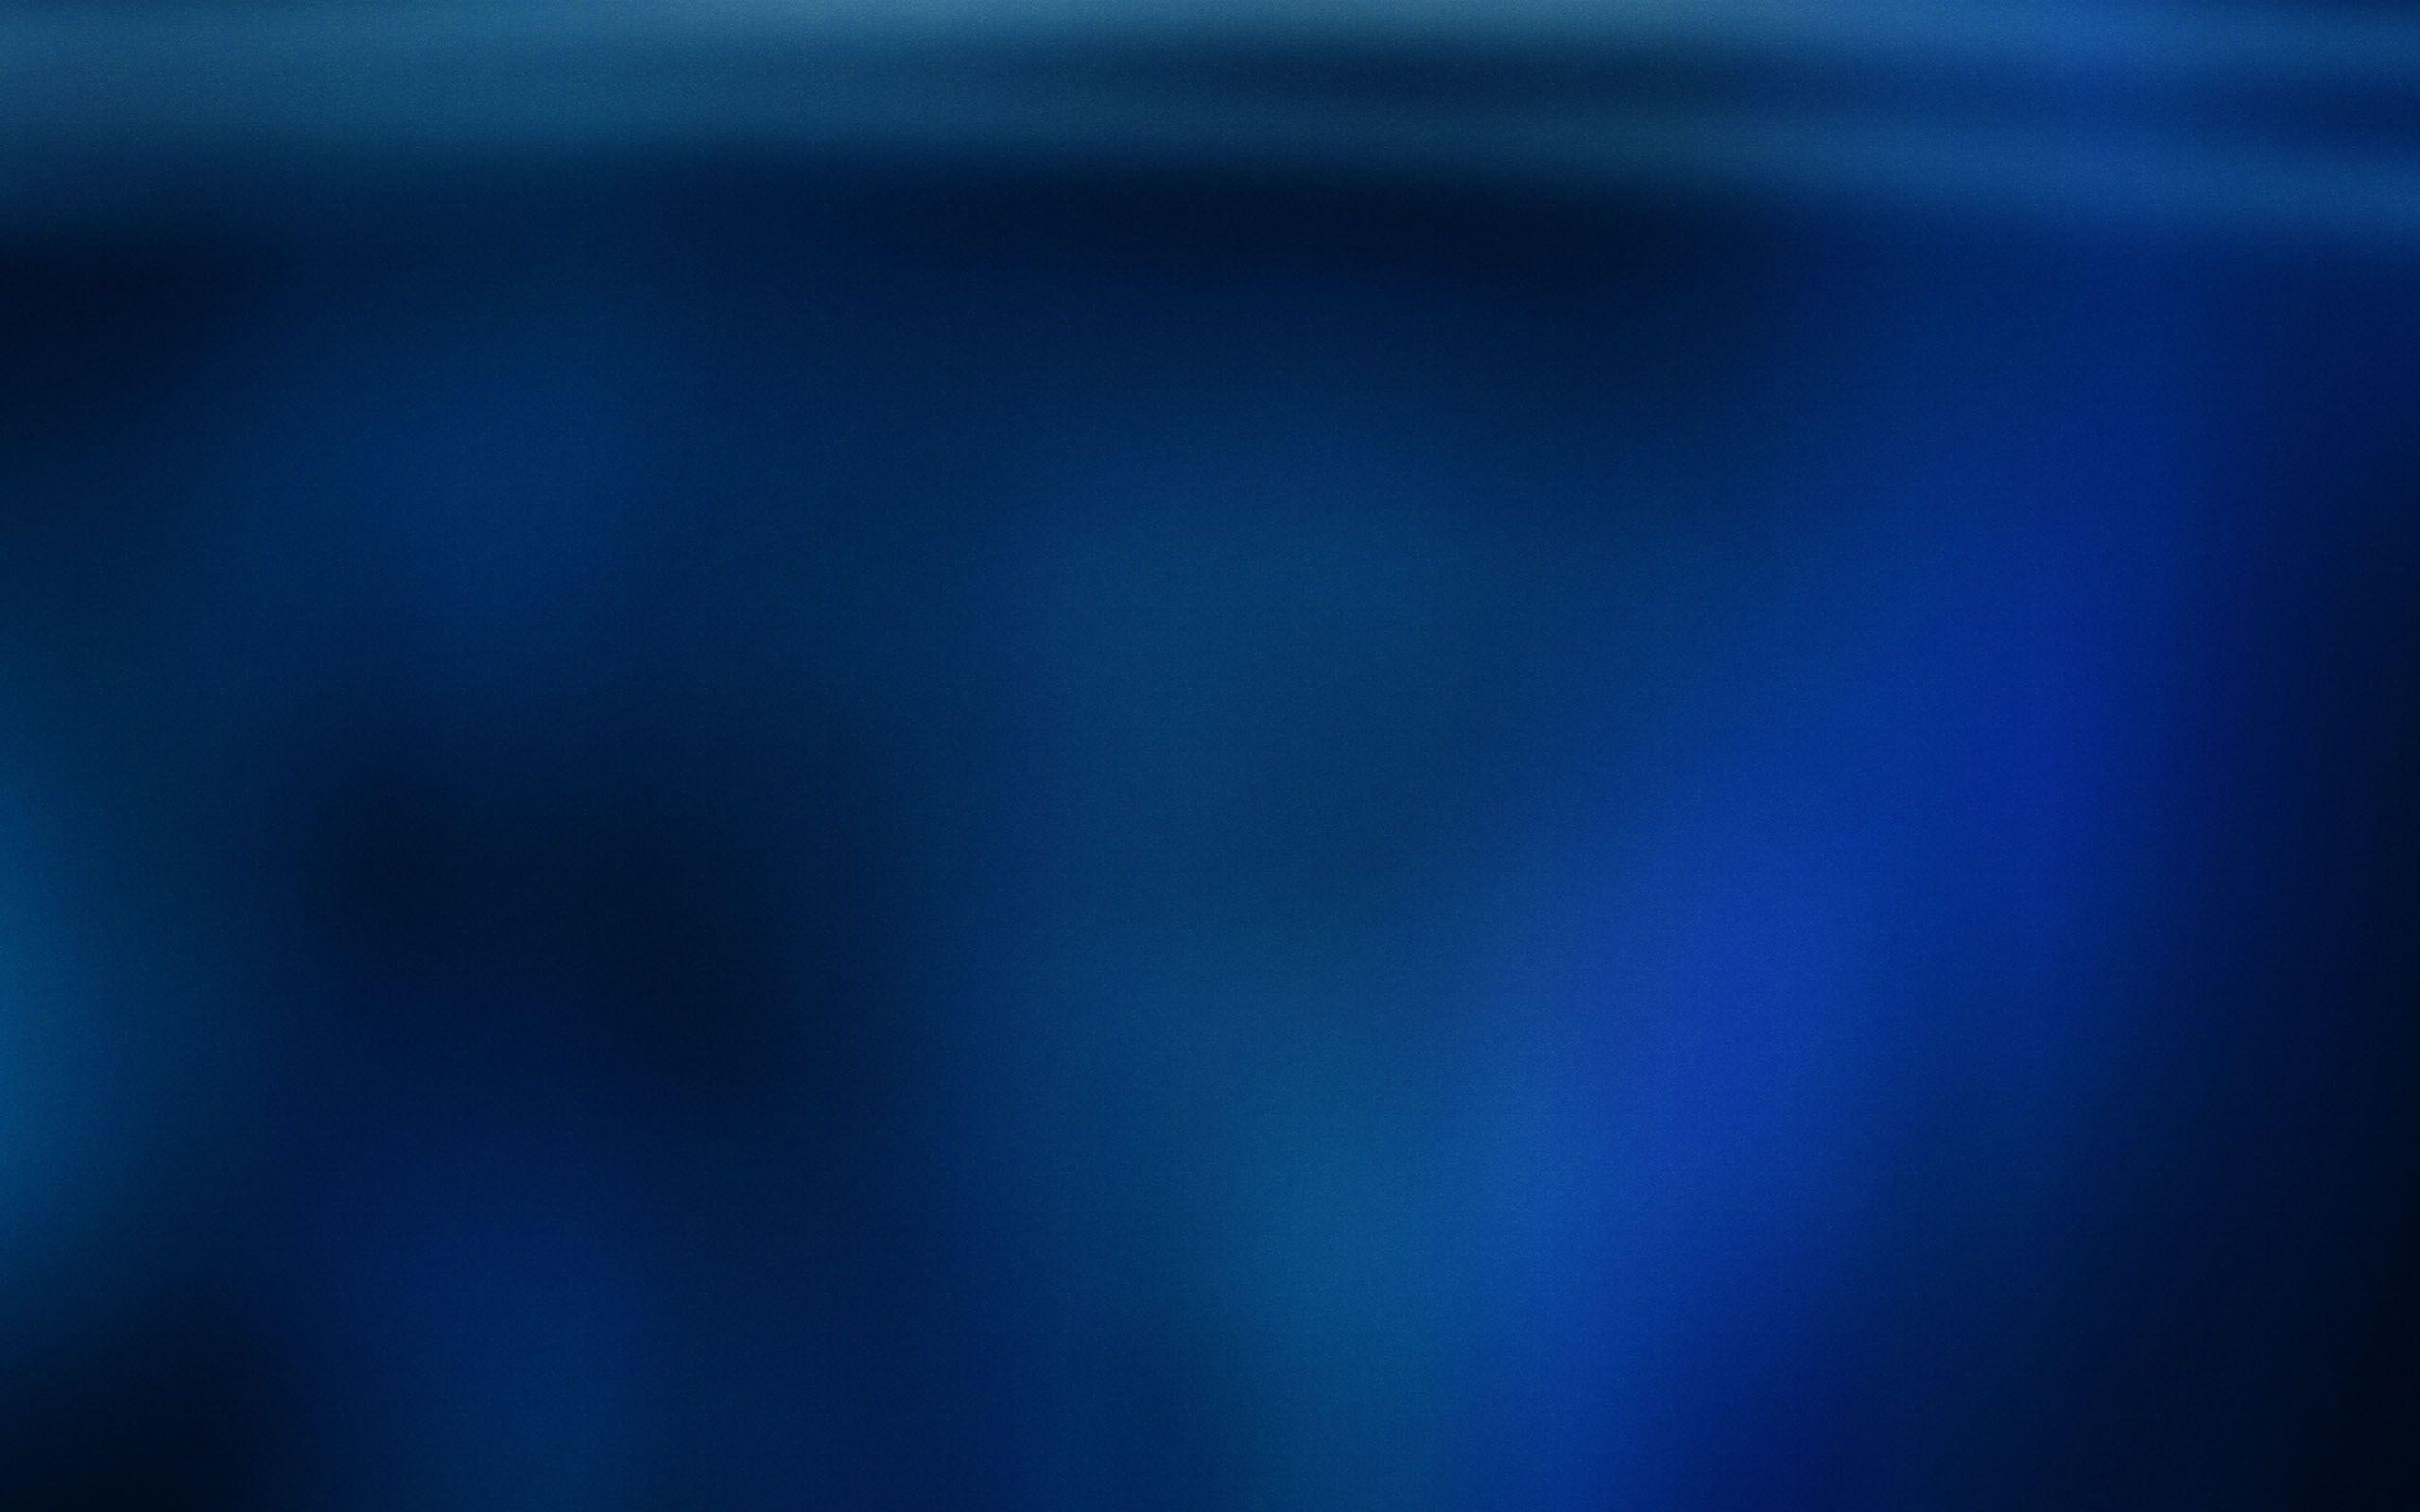 Plain Blue Backgrounds Wallpapers Wallpaper | HD ...